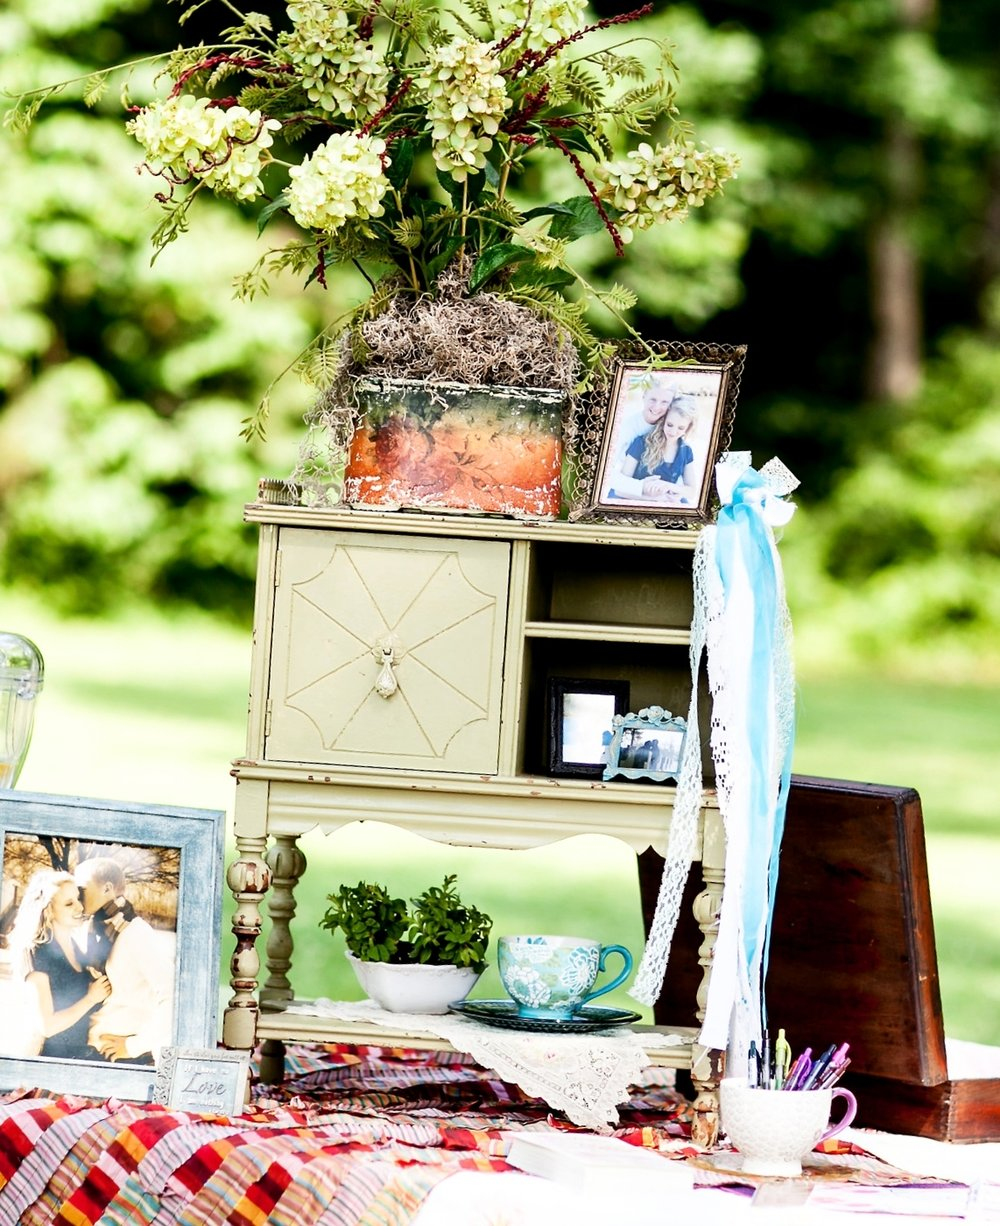 Green Hydrangea Floral ,Green Tobacco Cabinet